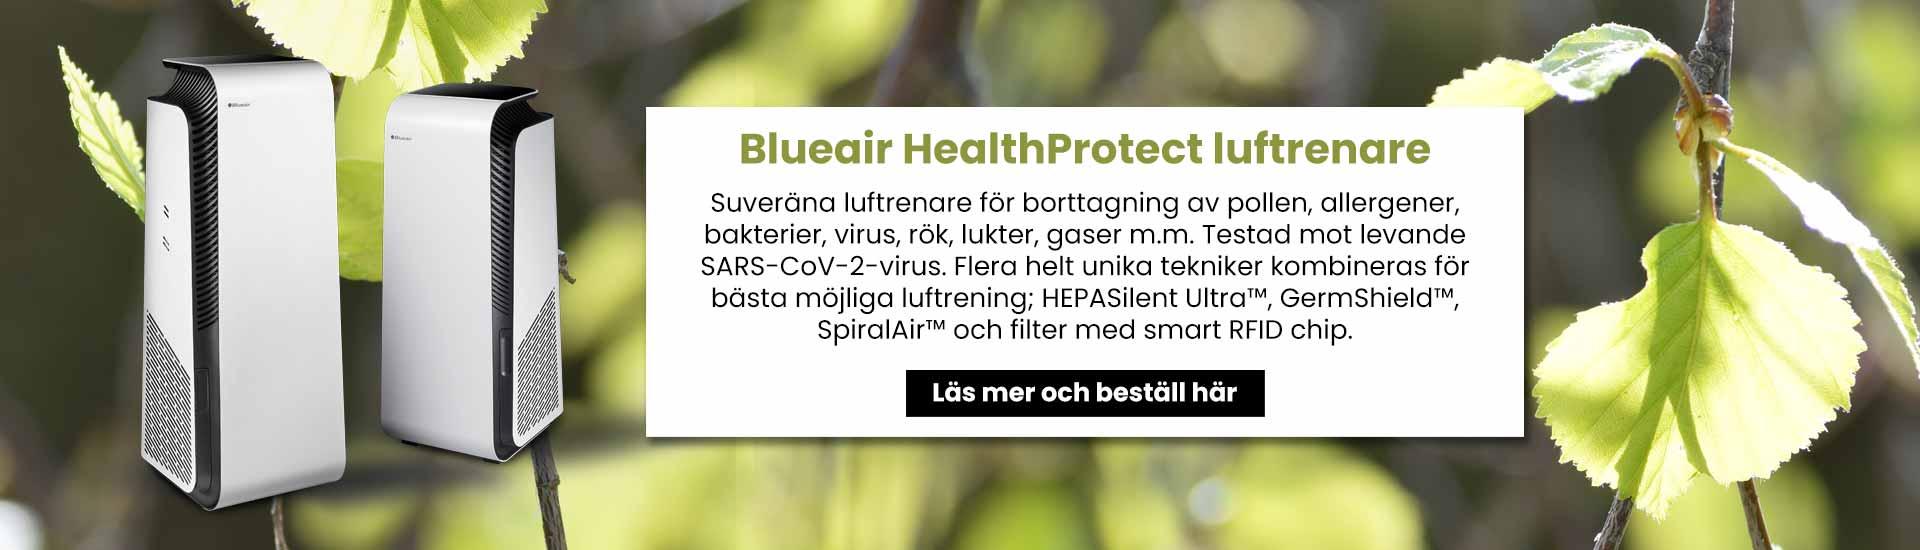 https://www.luftrenare.se/image/3179/healthProSpring21b.jpg